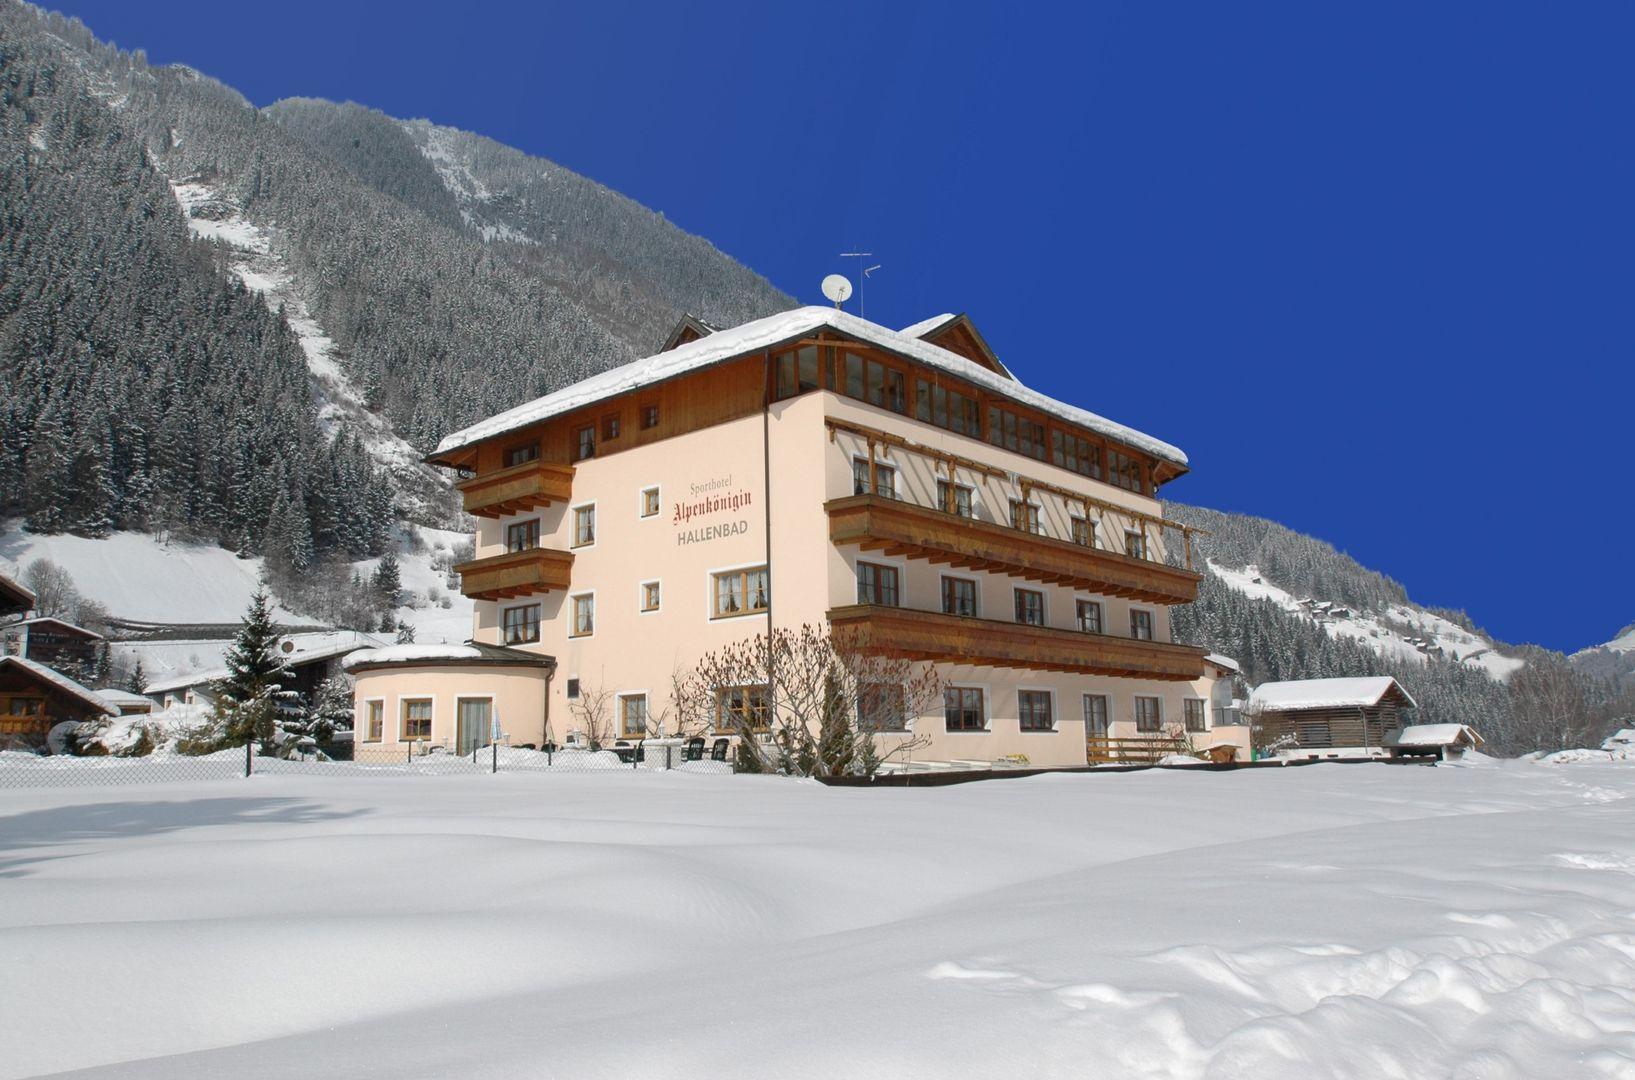 Hotel Alpenkonigin - Slide 1